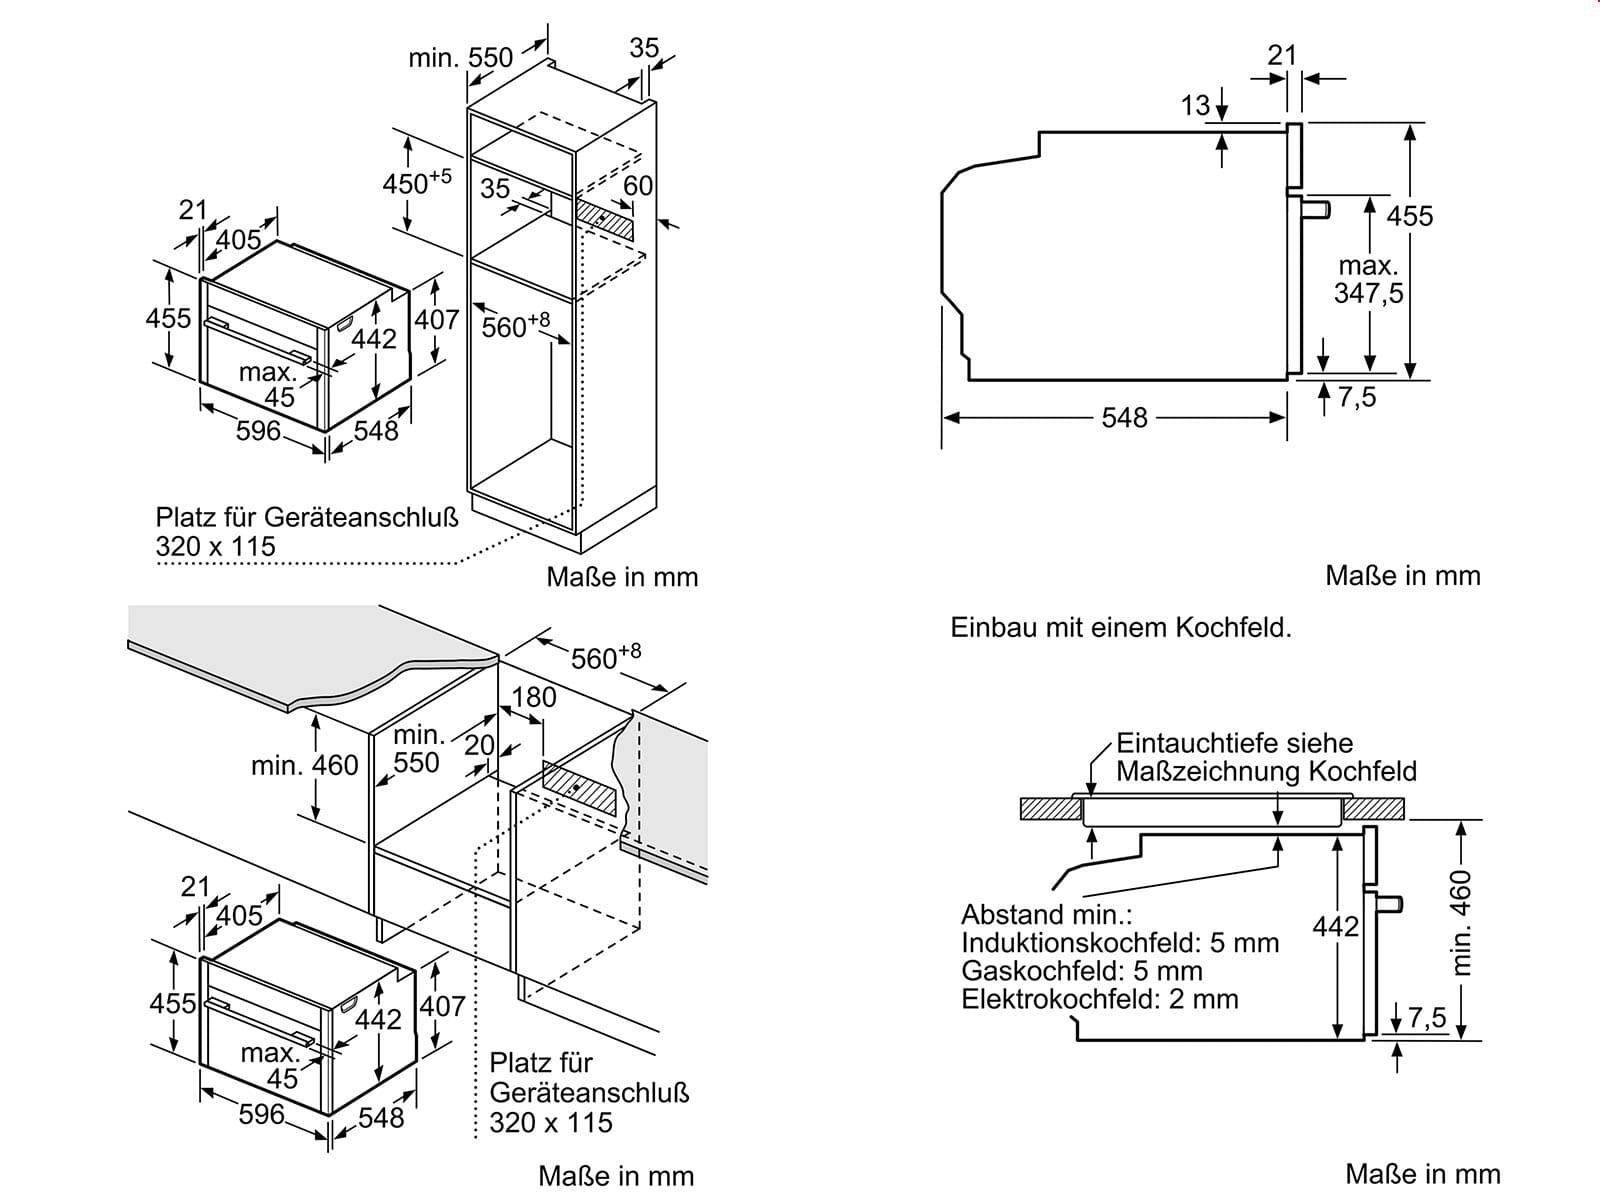 Neff CMT2623N Kompakt Backofen mit Mikrowelle Edelstahl